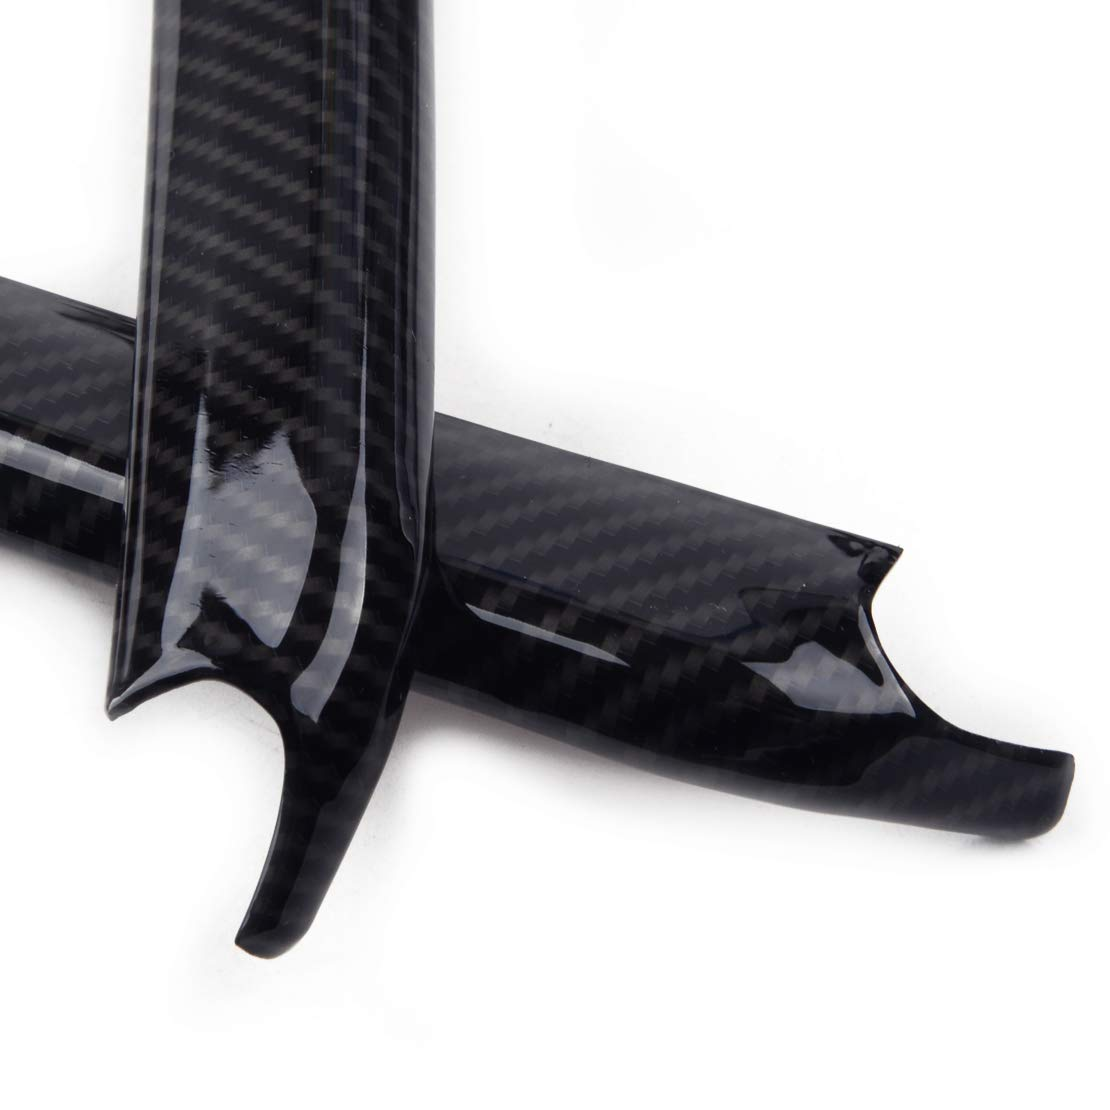 CITALL Kohlefaser ABS Autoarmlehne Box Dekoration Streifenverkleidung